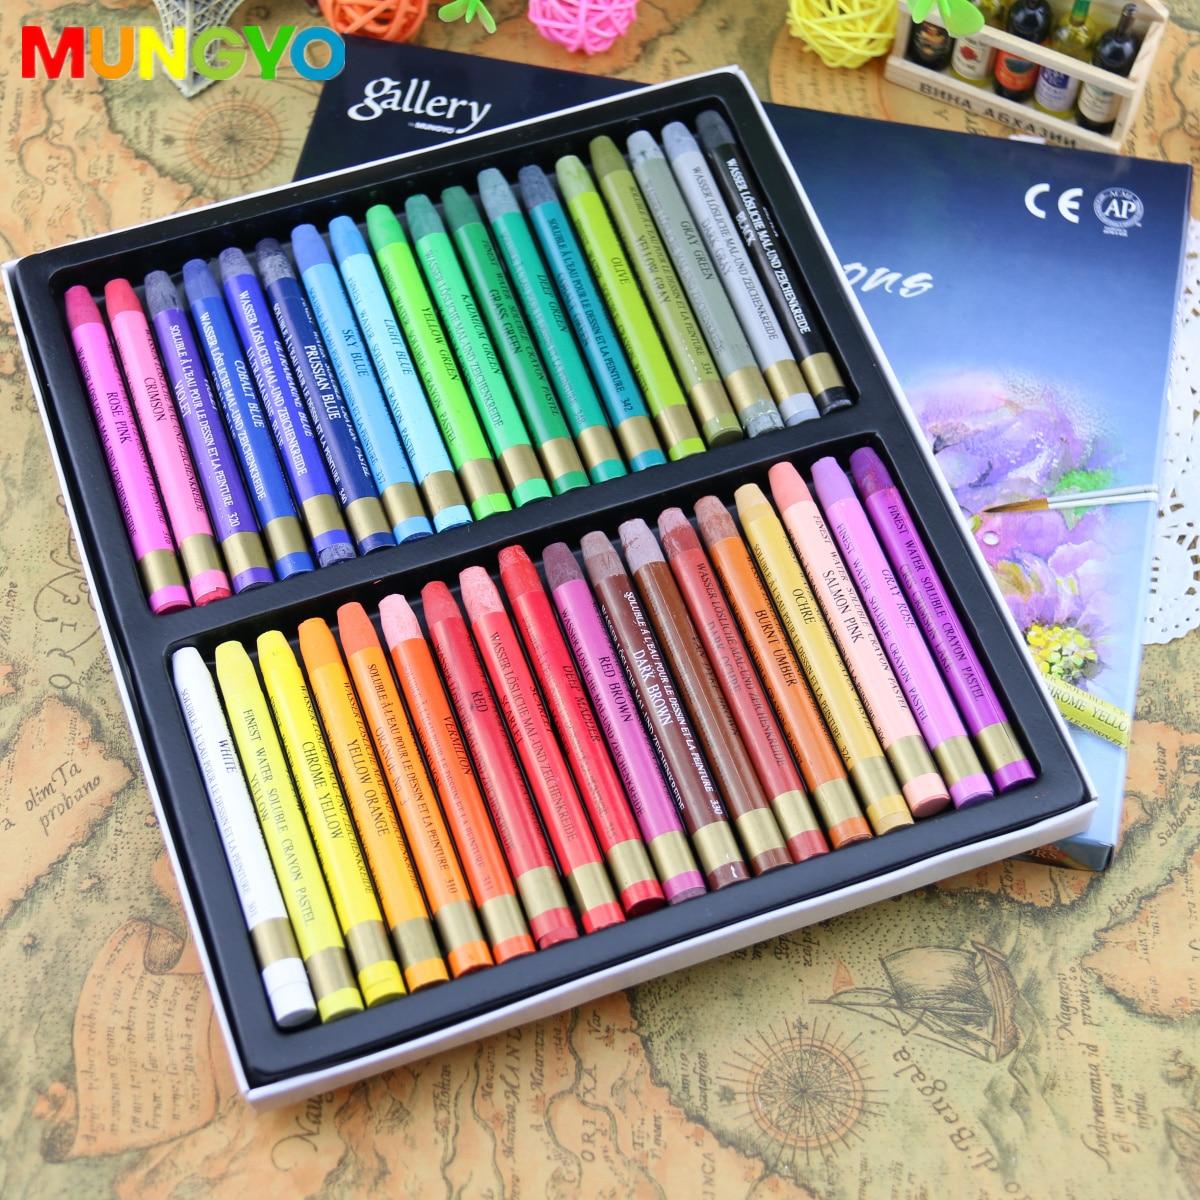 Mungyo Non-toxic Watercolors Crayons 12/24/36 Colors Assorted Set Art Supplies